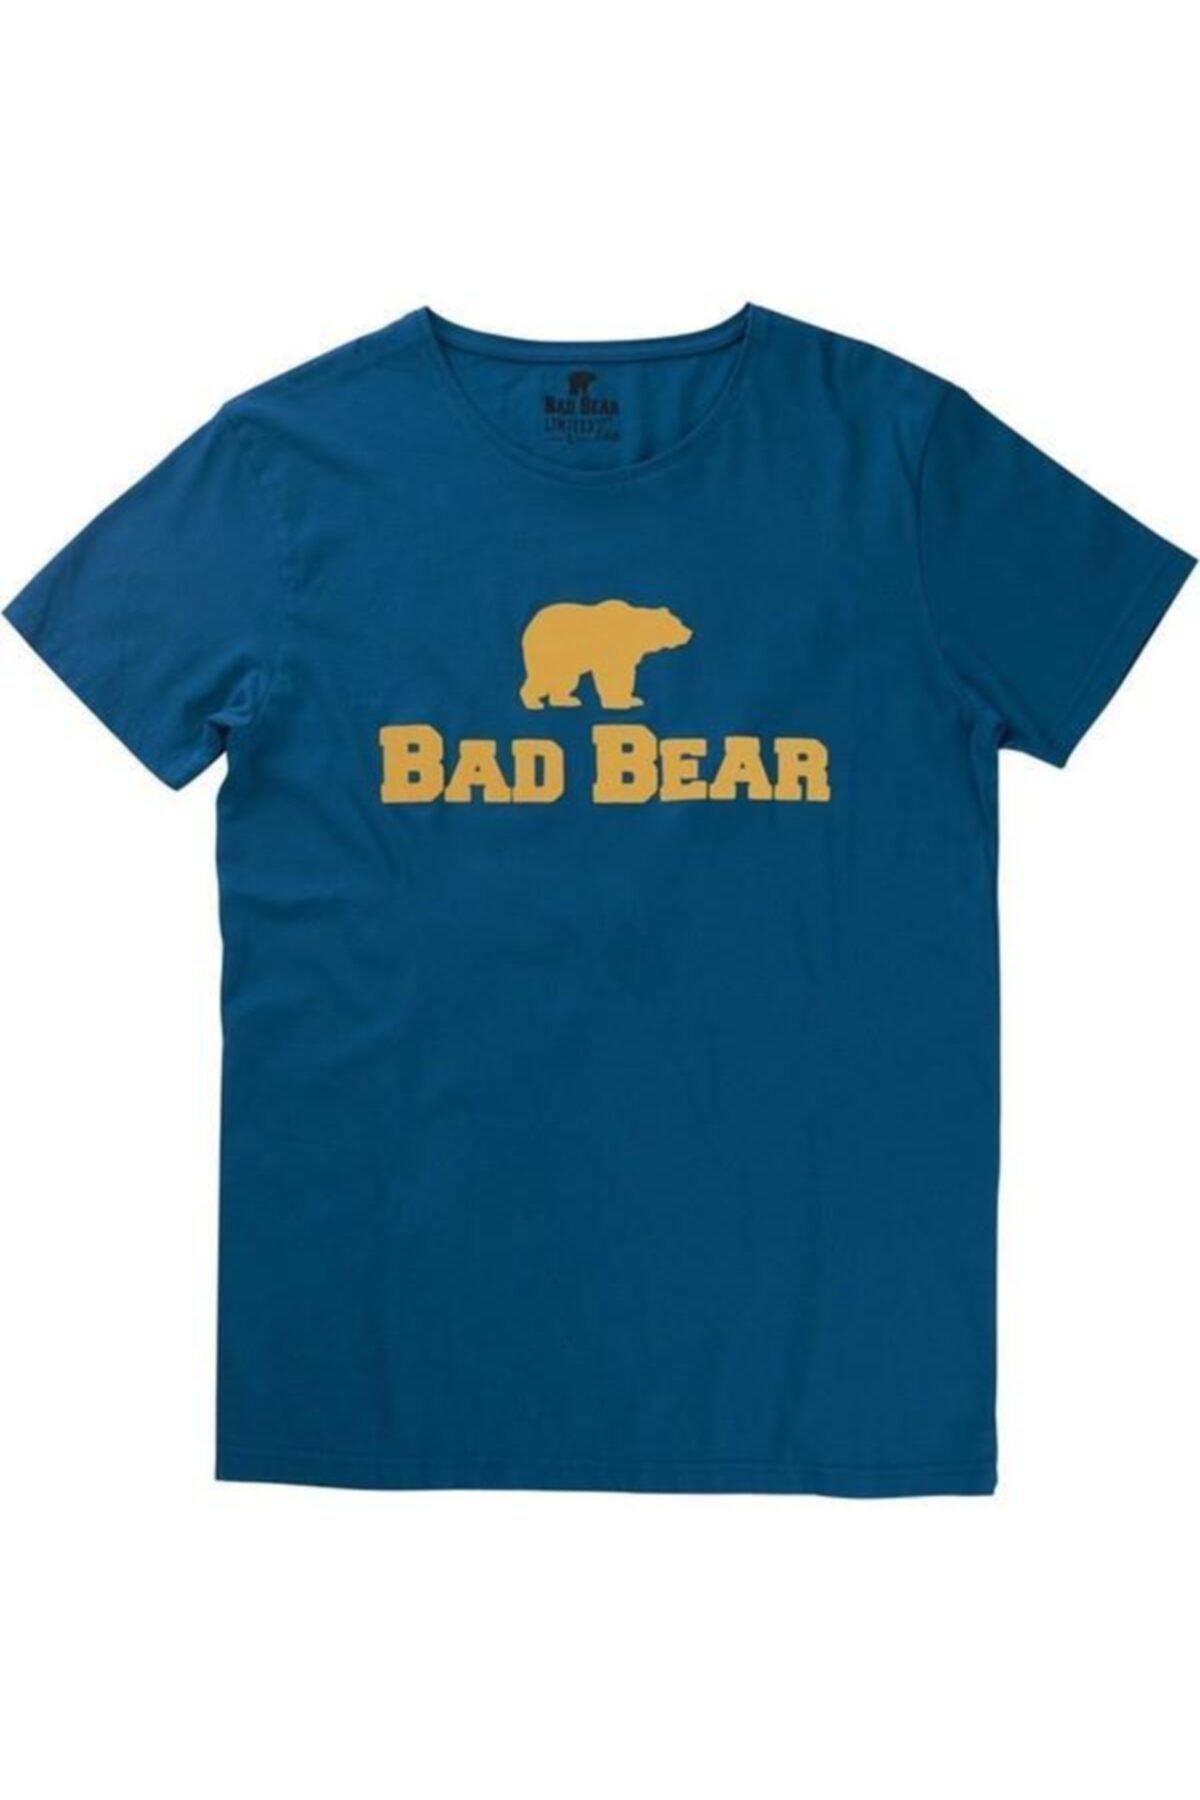 Bad Bear Erkek Baskılı Tshirt 19.01.07.002 1